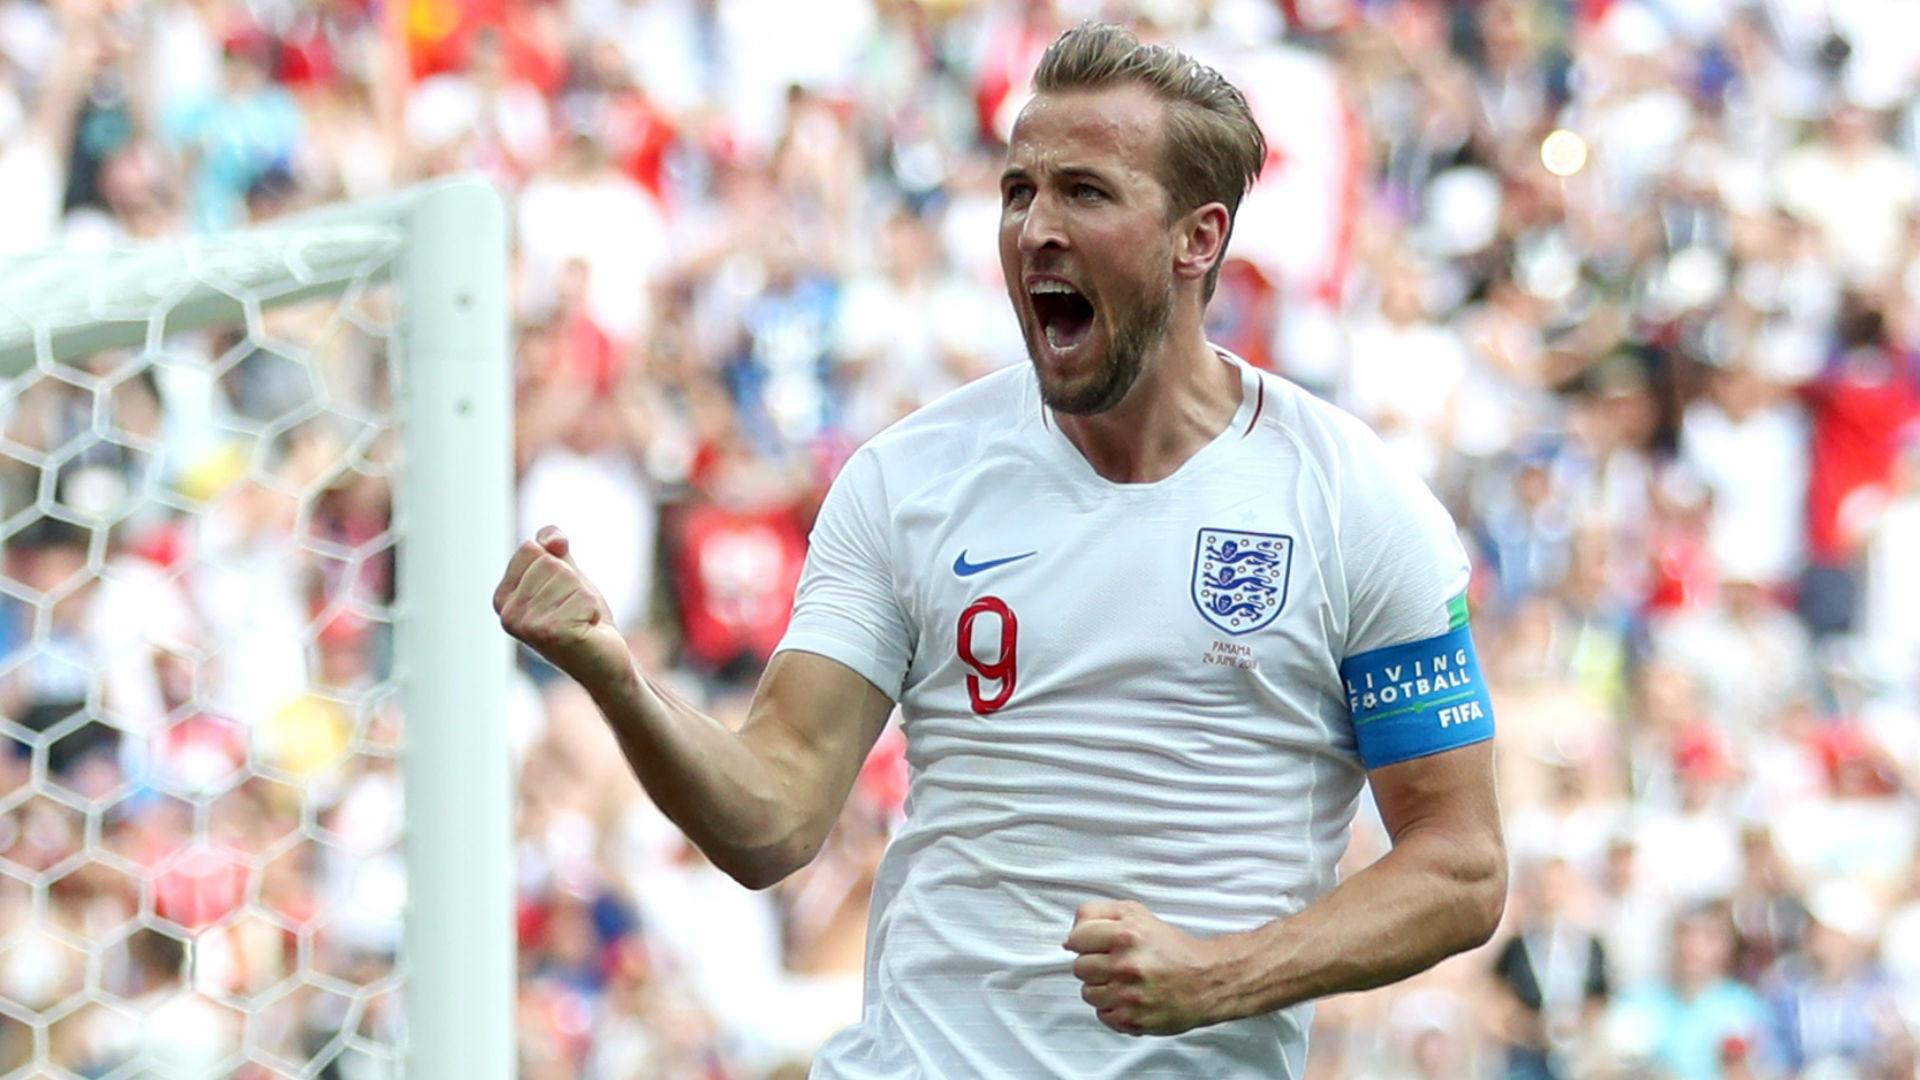 harry-kane-england-panama-world-cup-2018_1ldwpg7nssrxl1rddjy5s31r7x